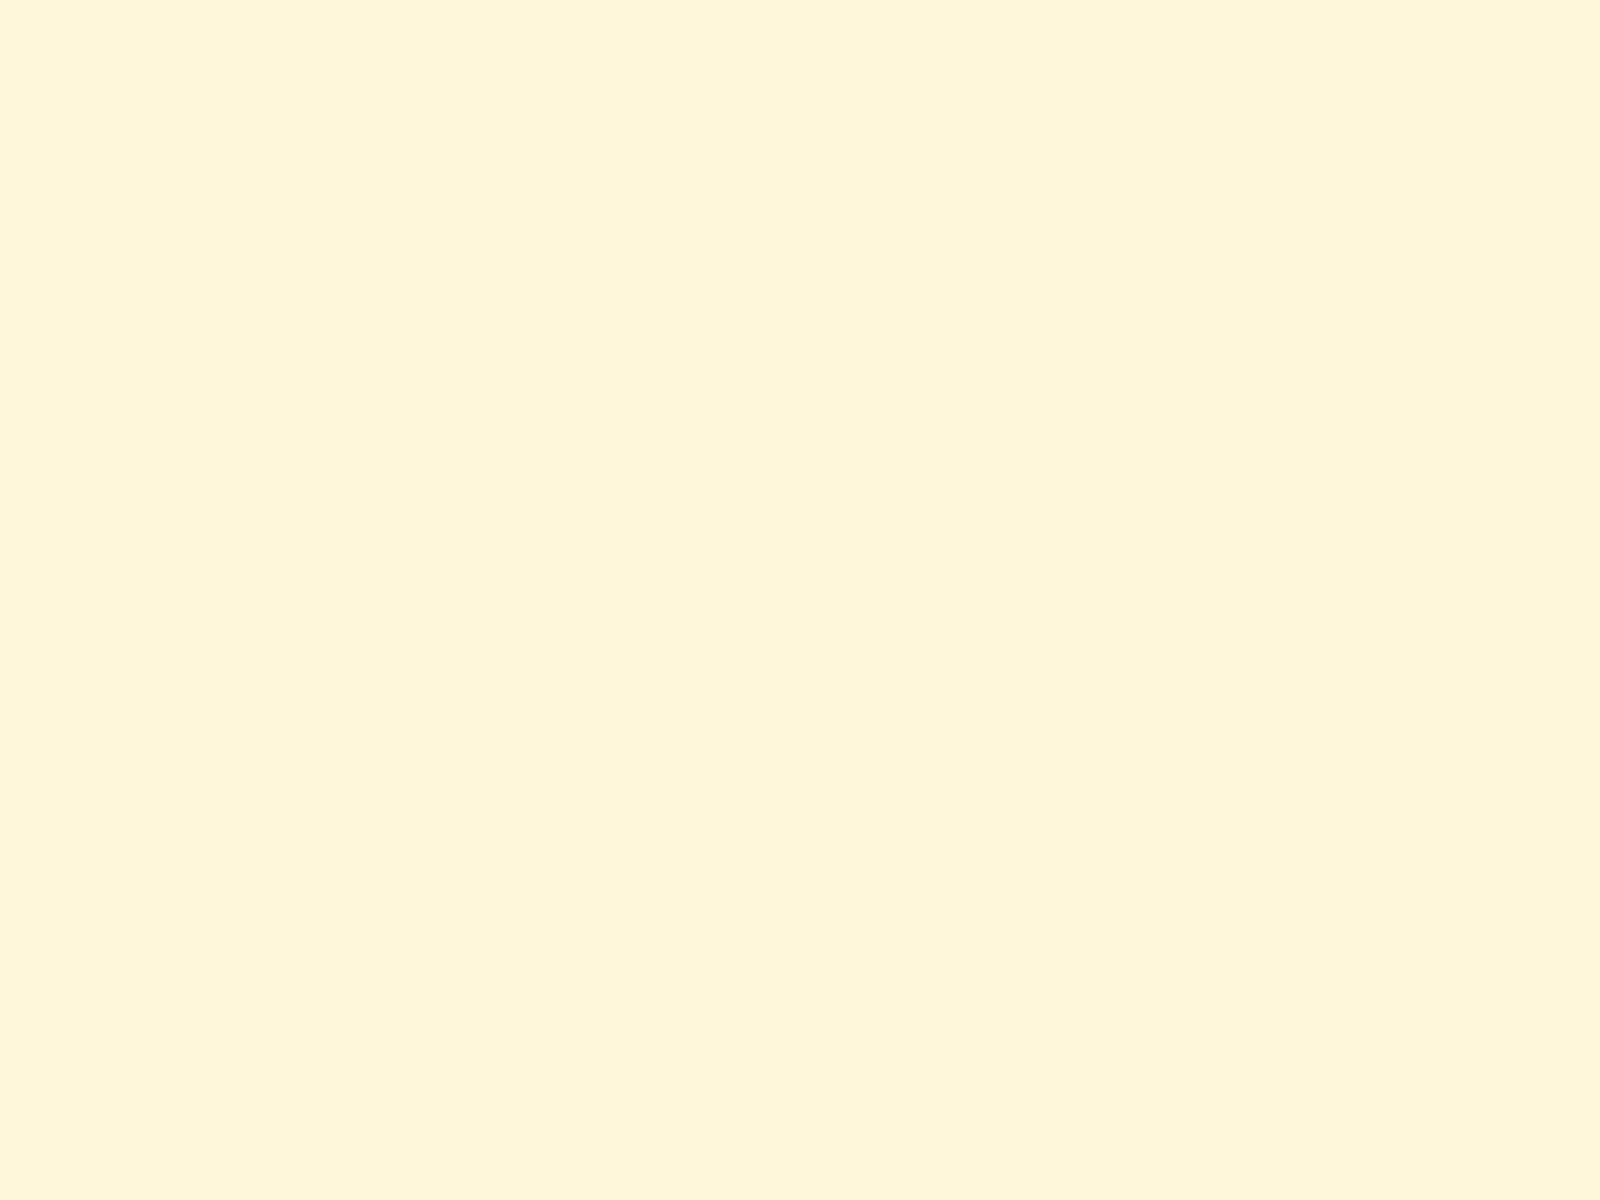 1600x1200 Cornsilk Solid Color Background